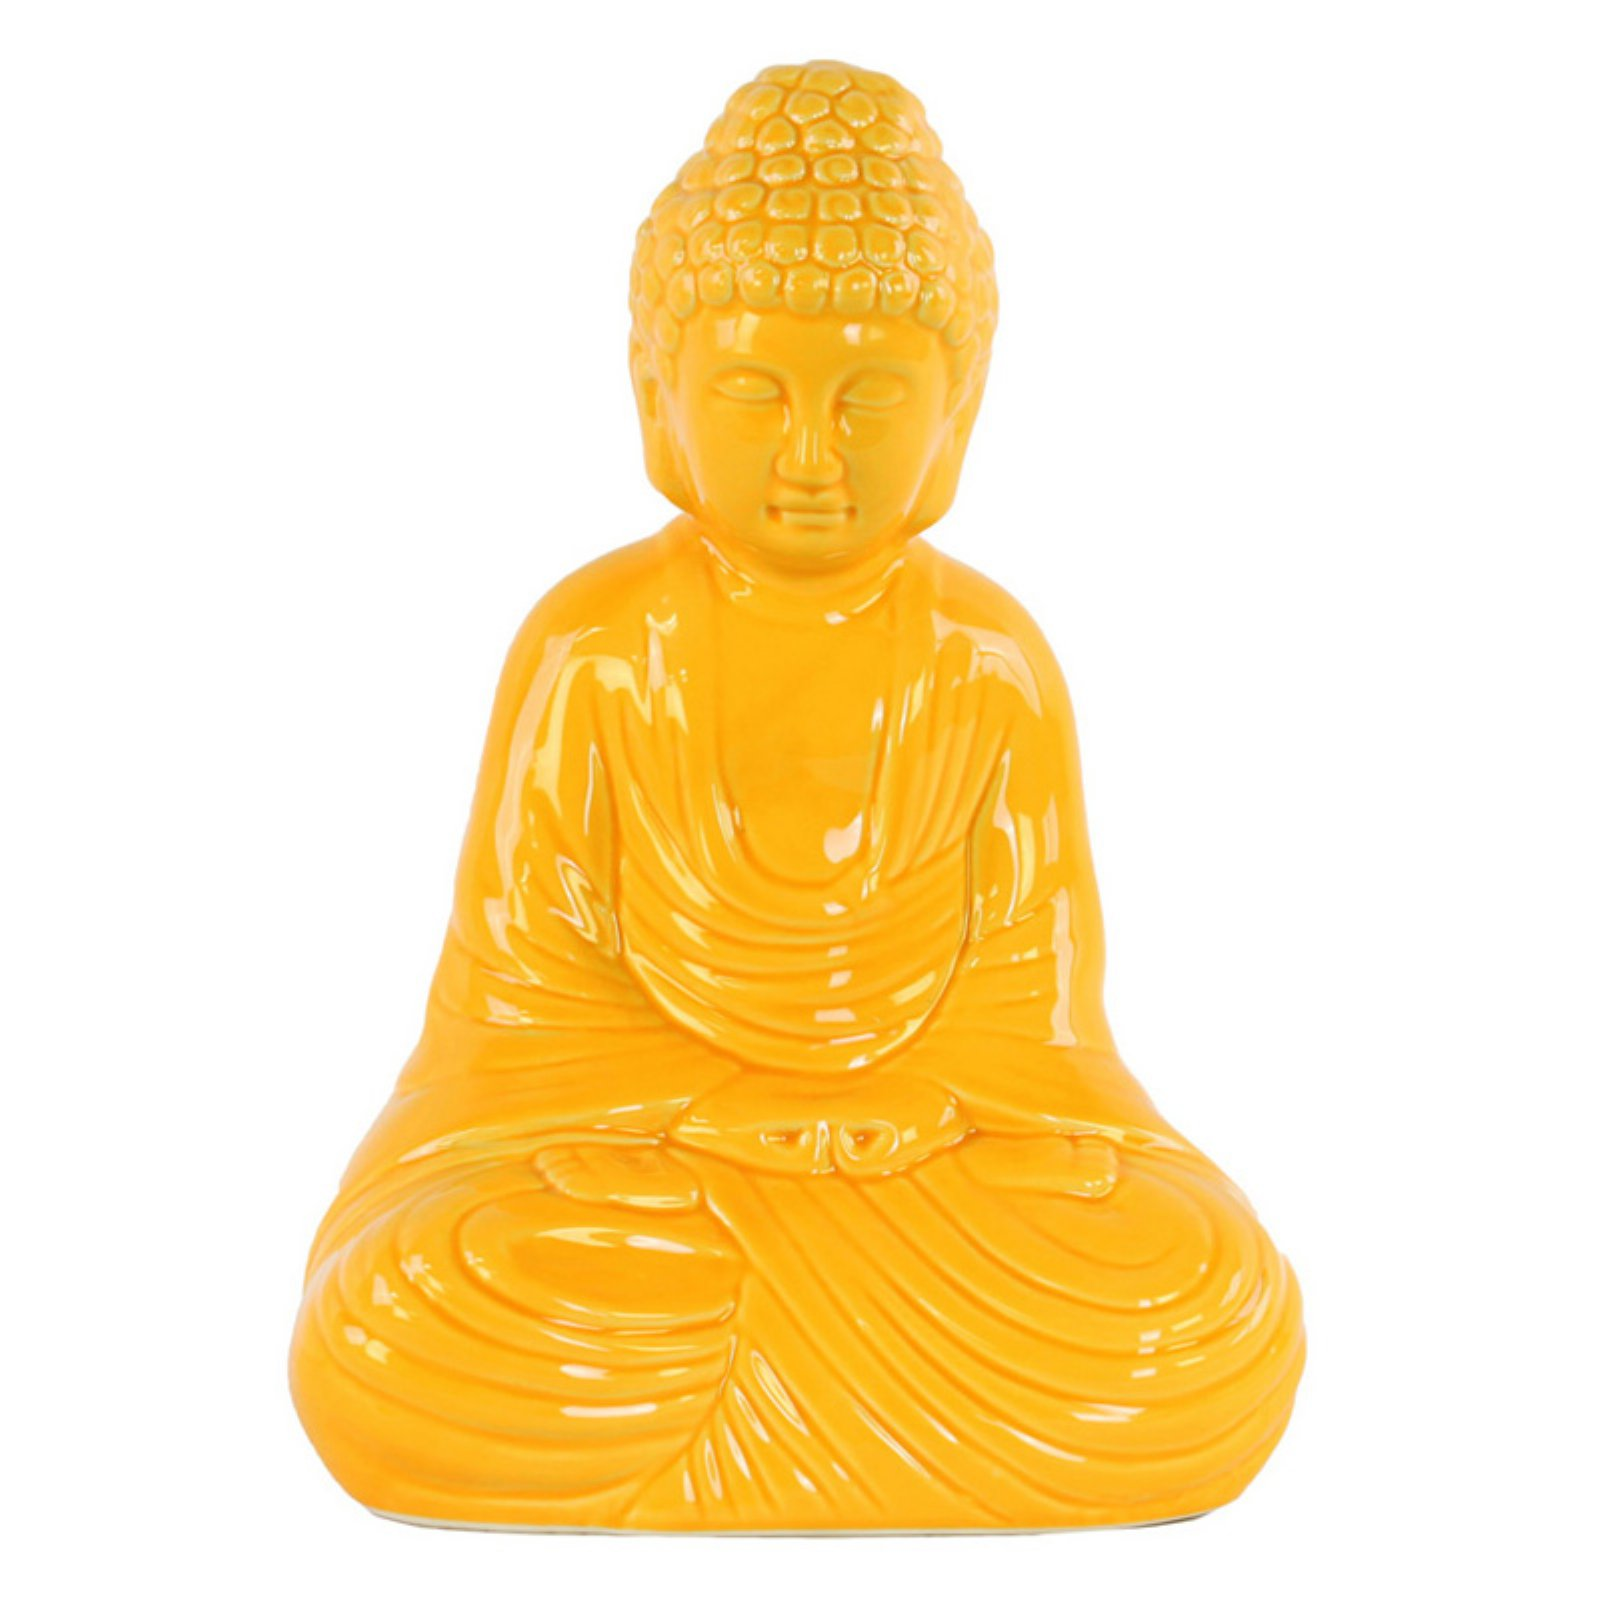 Urban Trends Collection: Ceramic Buddha Figurine, Gloss Finish, White